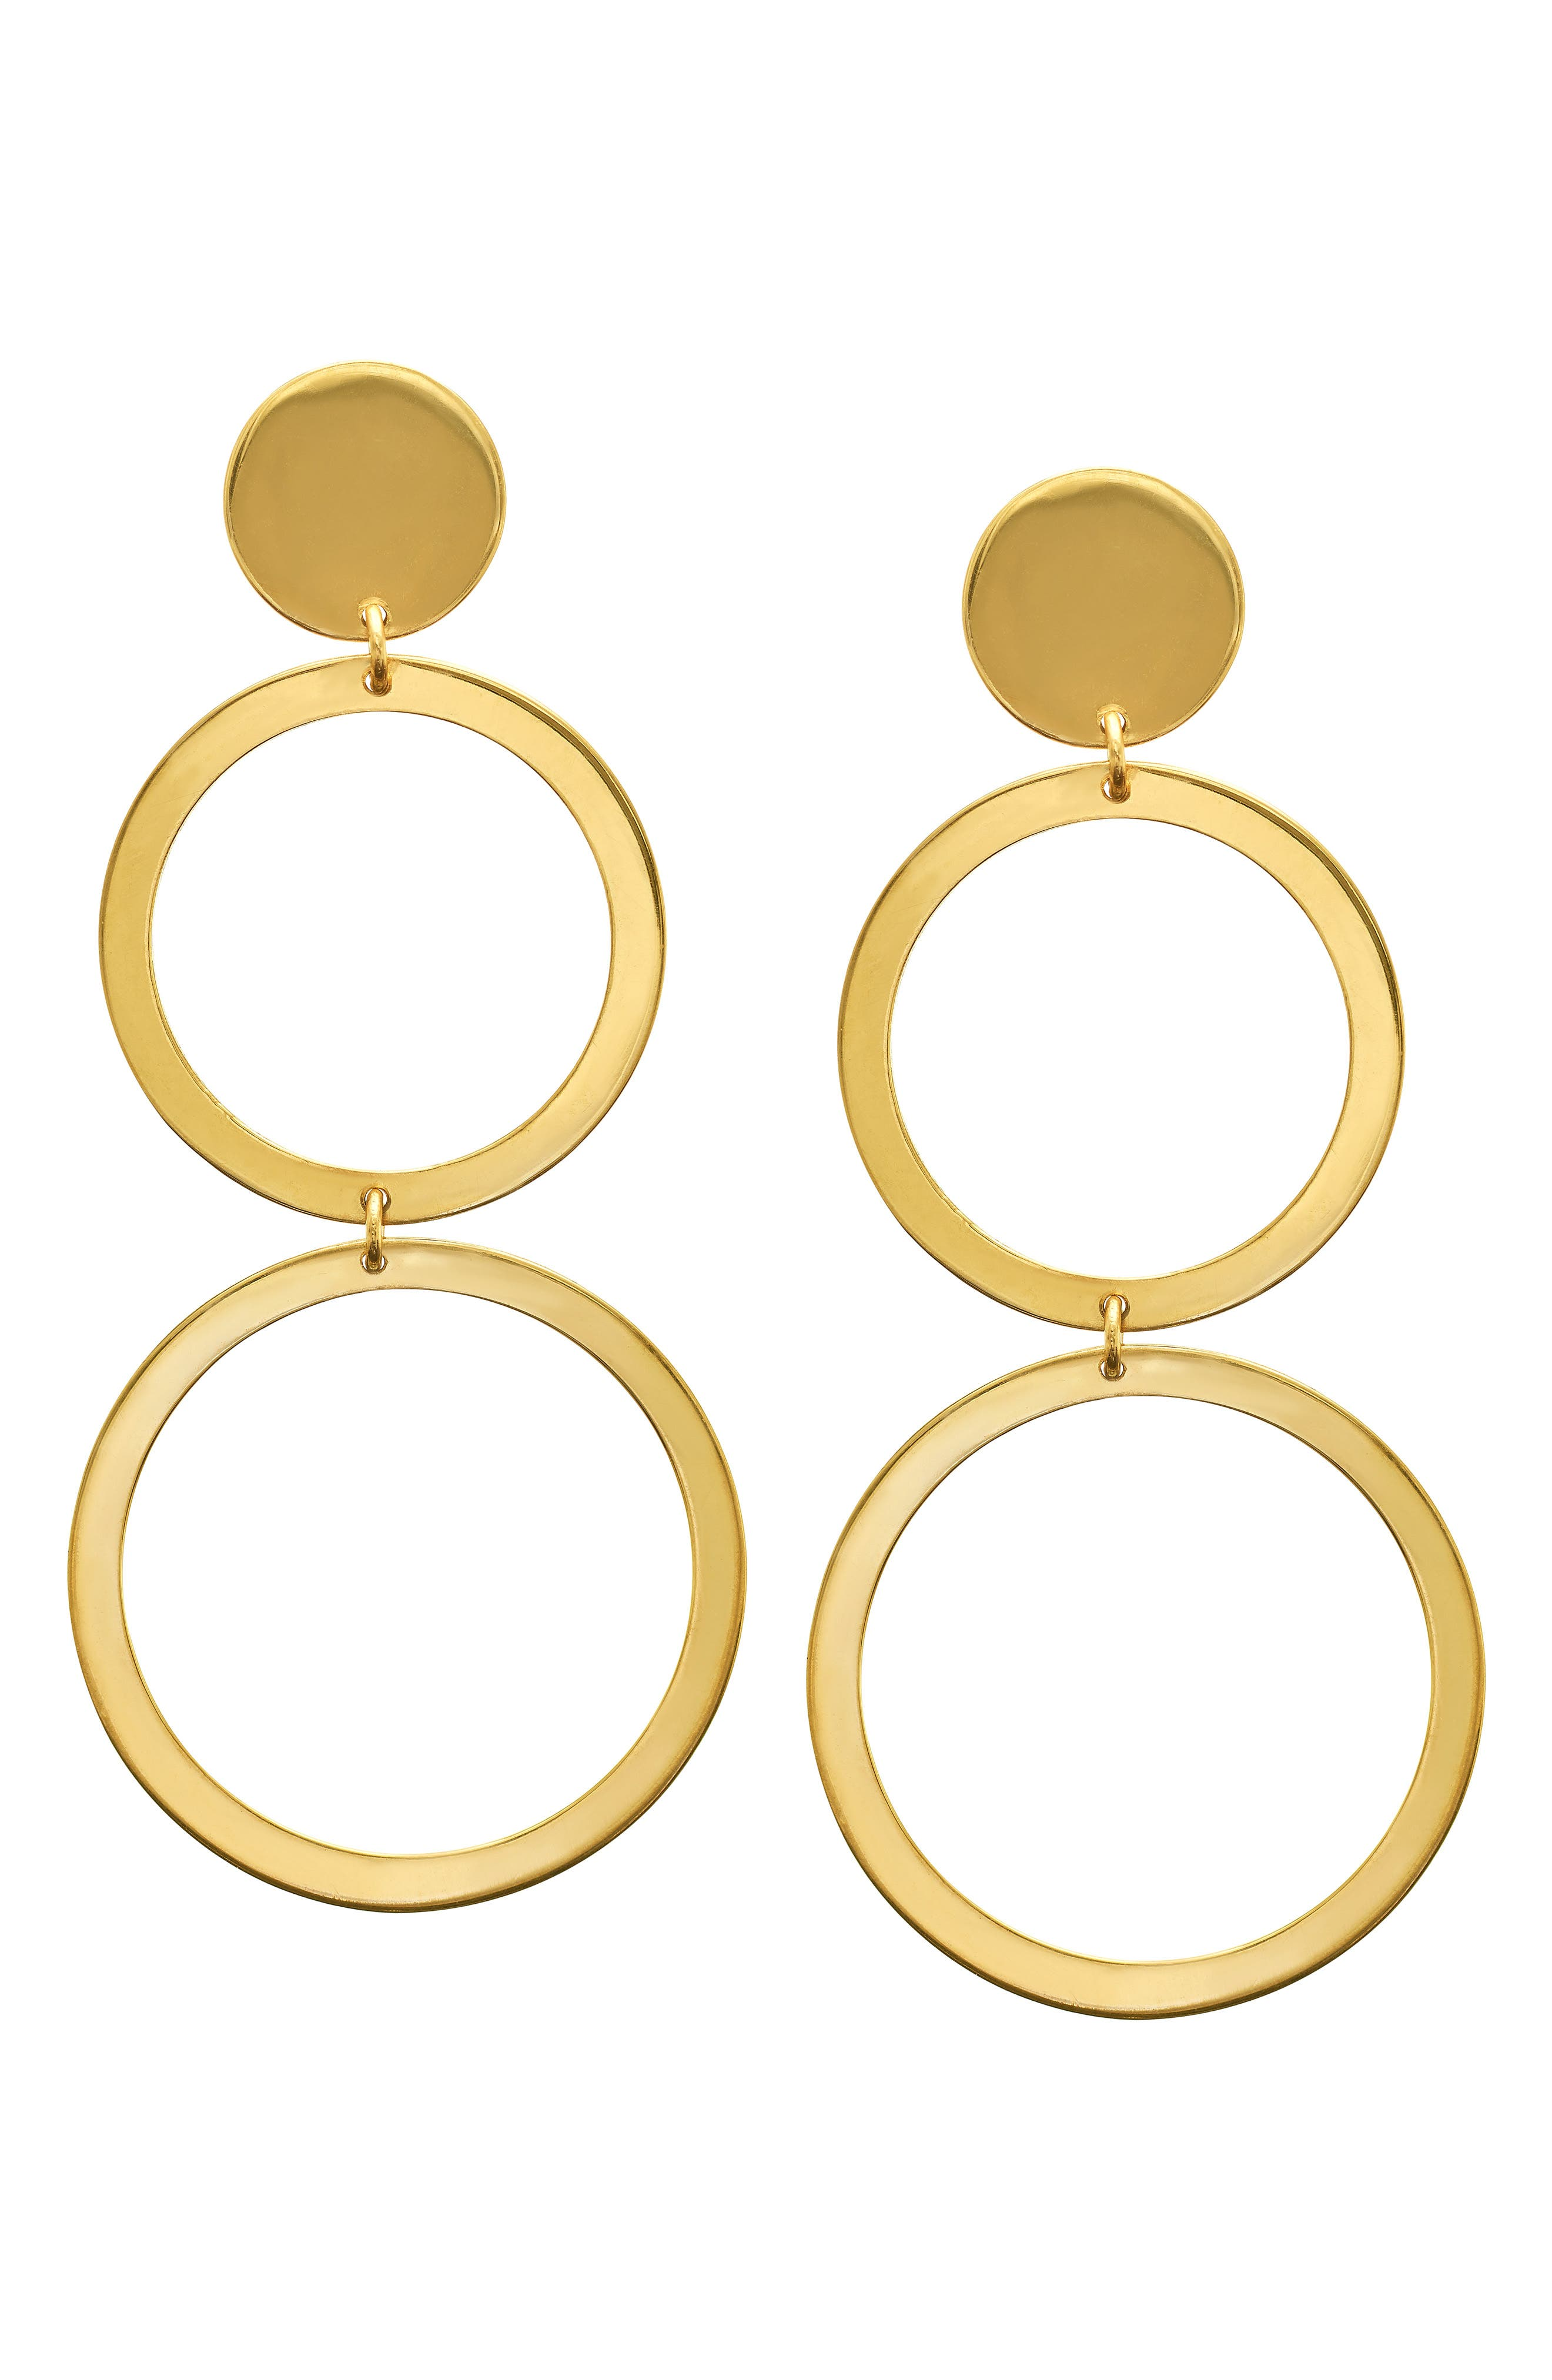 Double Drop Earrings,                             Main thumbnail 1, color,                             YELLOW GOLD